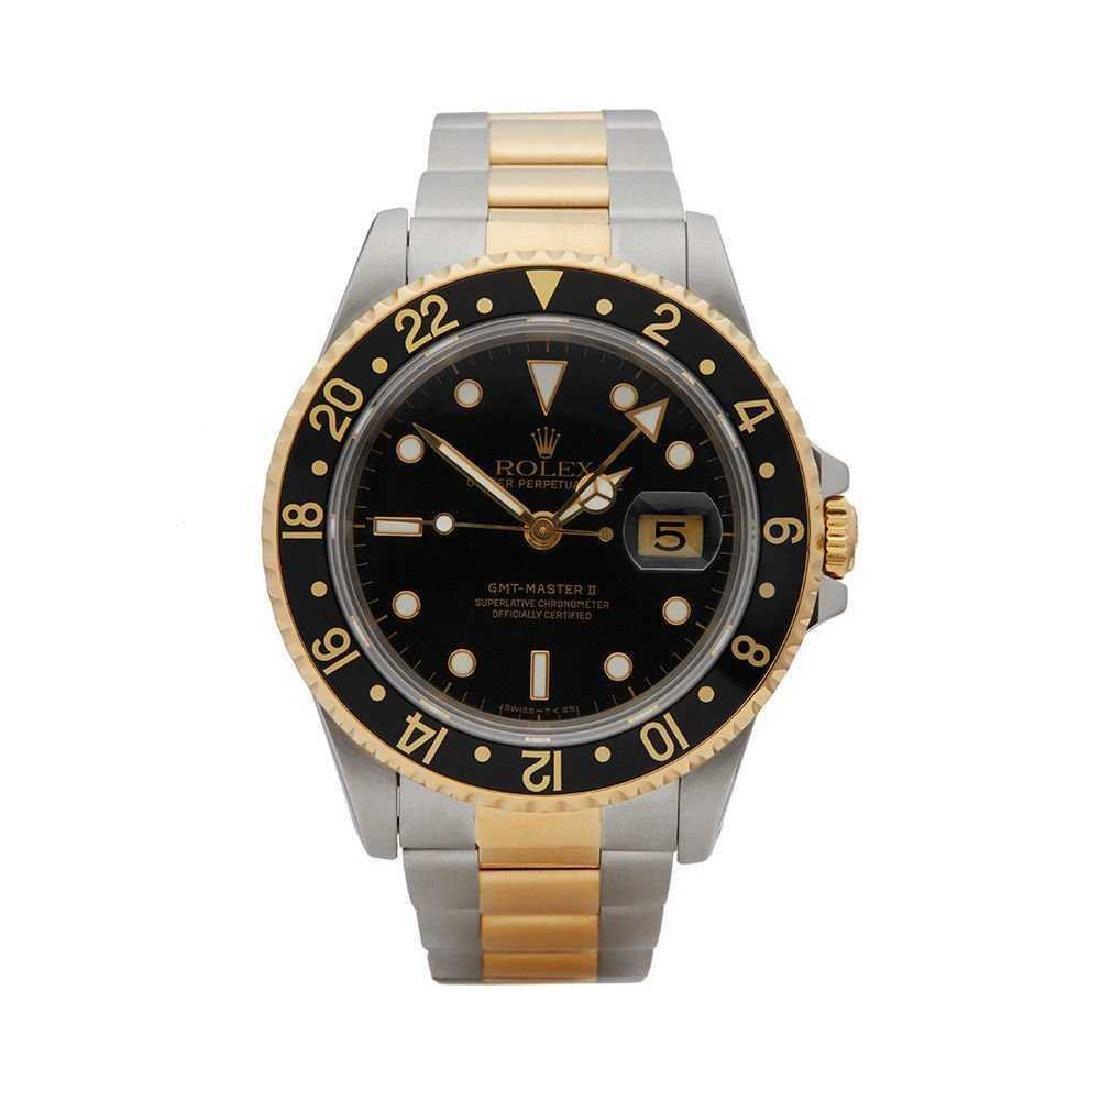 Rolex GMT Master II 16713, SS & 18K, Mens Watch.